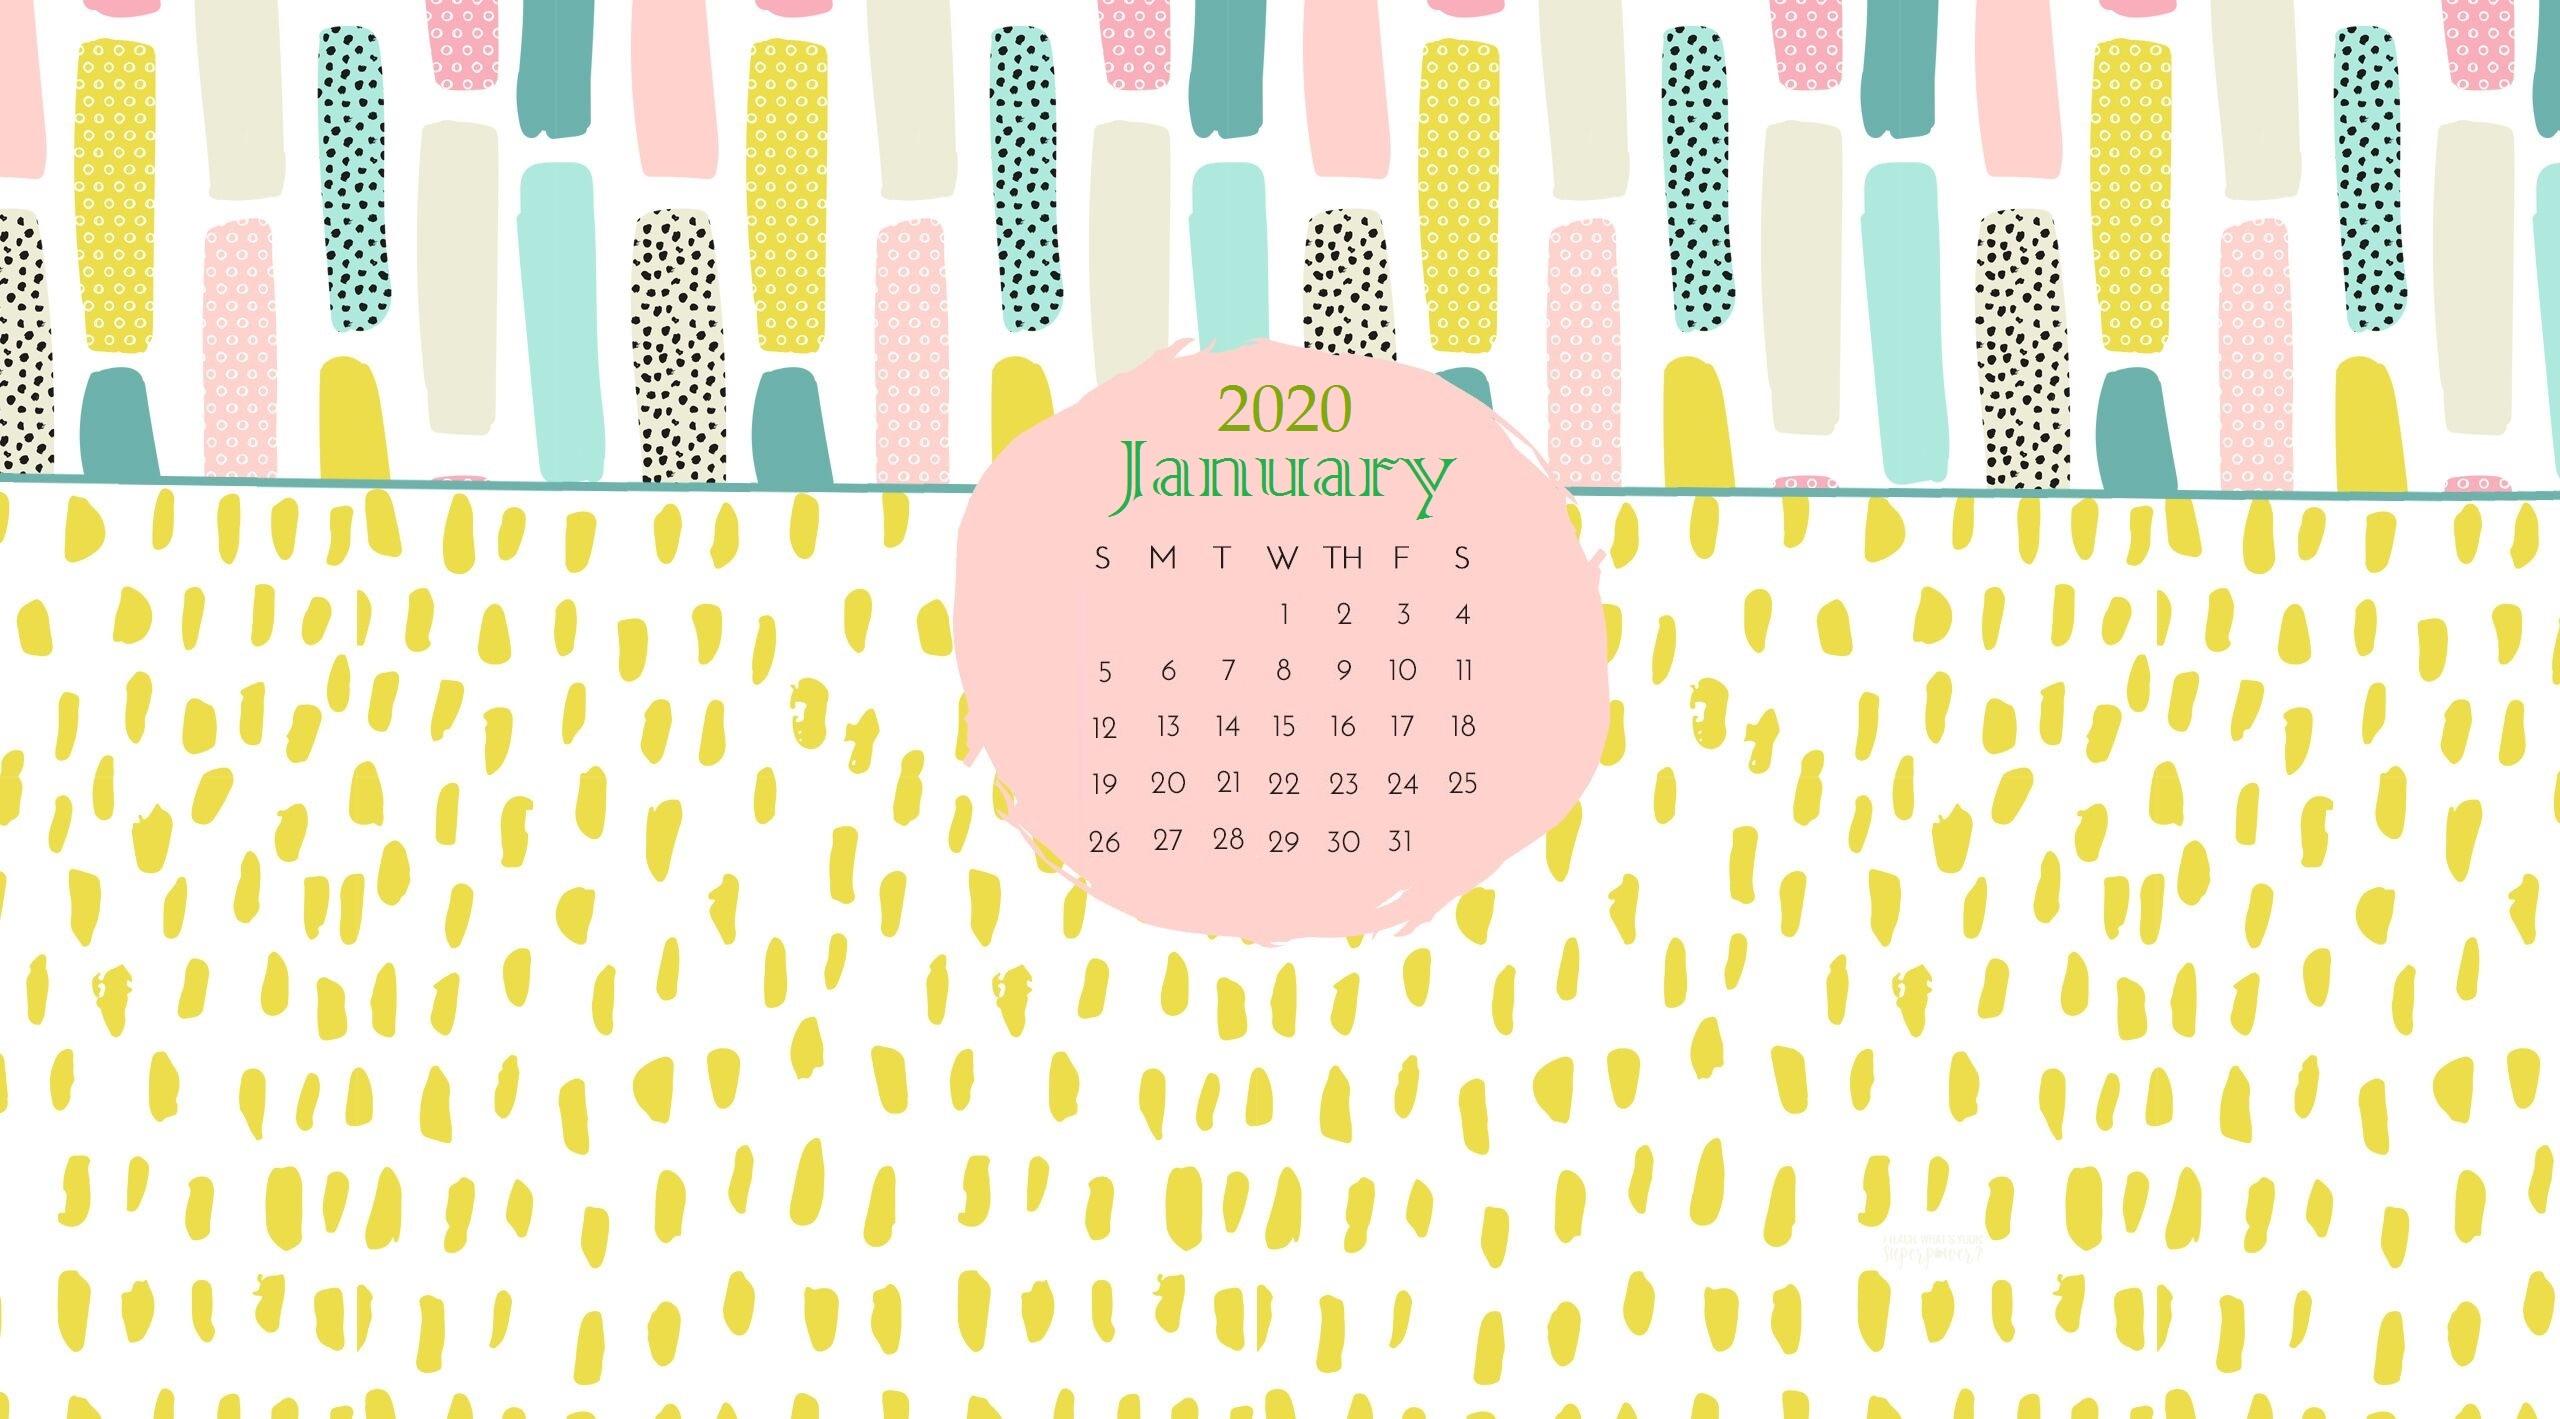 January 2020 Desktop Calendar Wallpaper